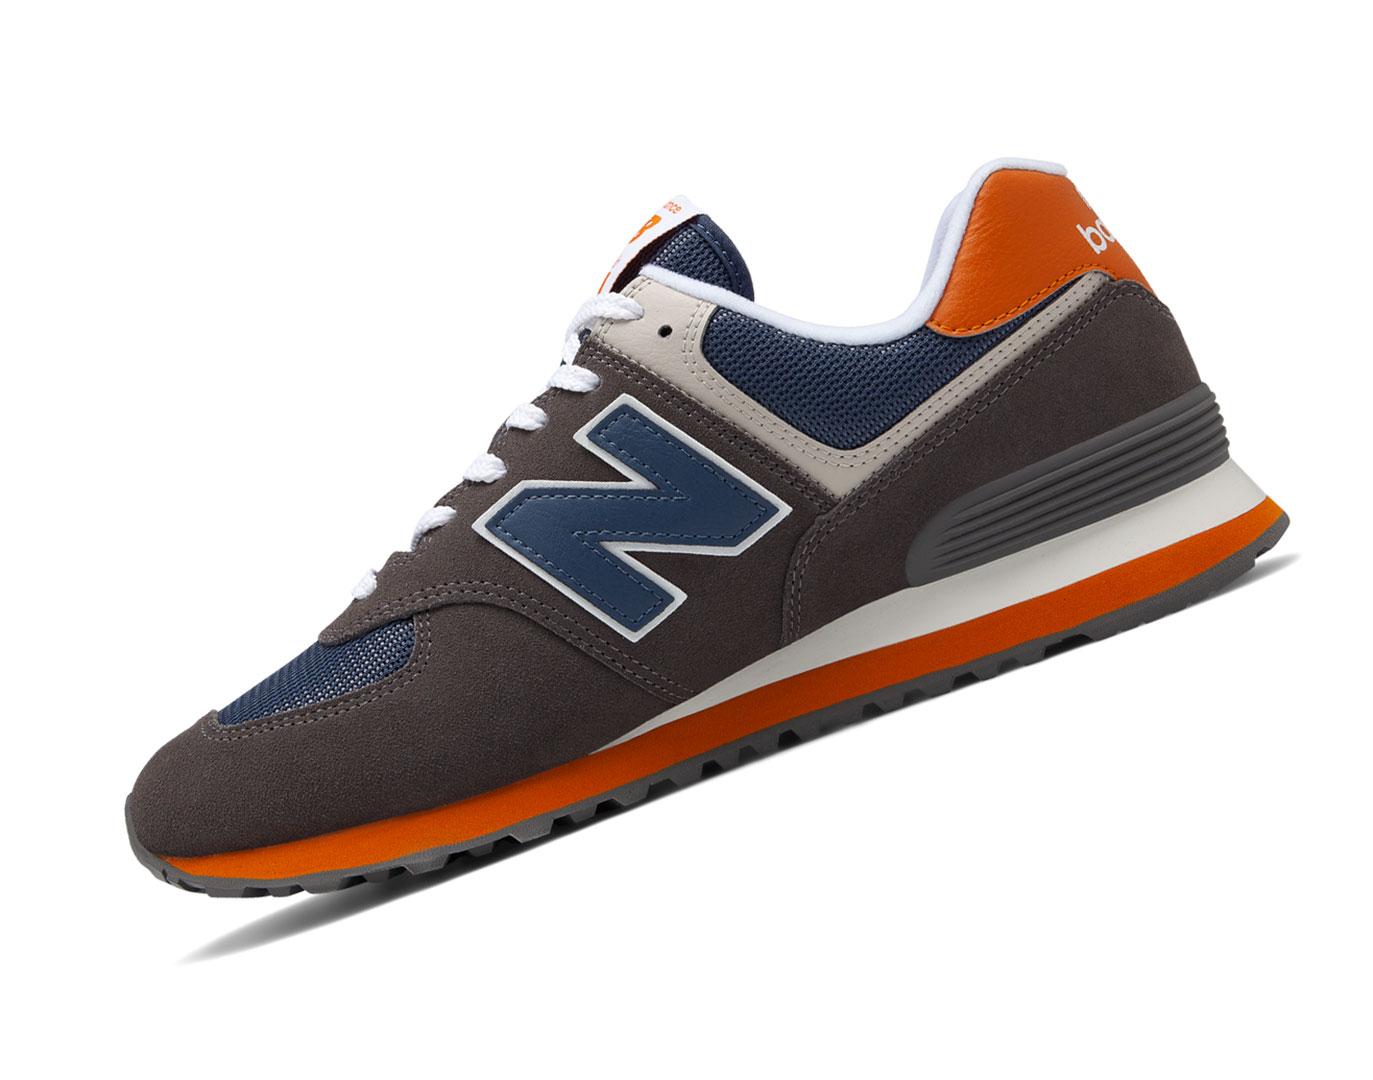 sports shoes d1dd0 55e67 New Balance 574 Classics ML574MUC Mehrfarbig Retro Herren Sneaker